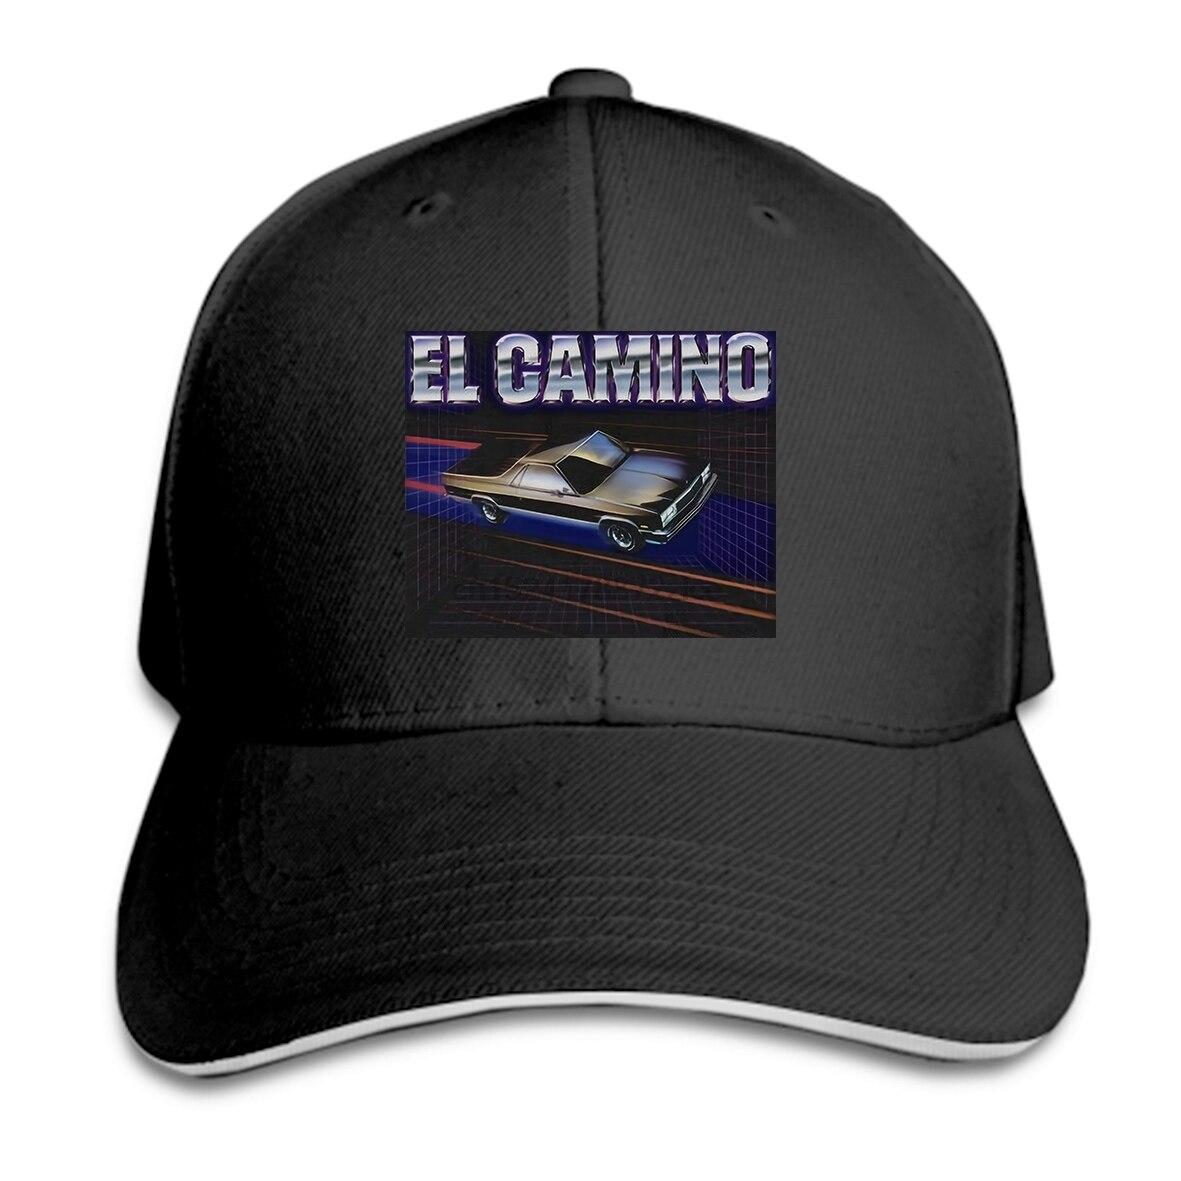 Smart Print Custom Baseball Cap Chevrolet El Camino 85 Licensed Adult Hat Peaked Cap Fine Craftsmanship Back To Search Resultsapparel Accessories